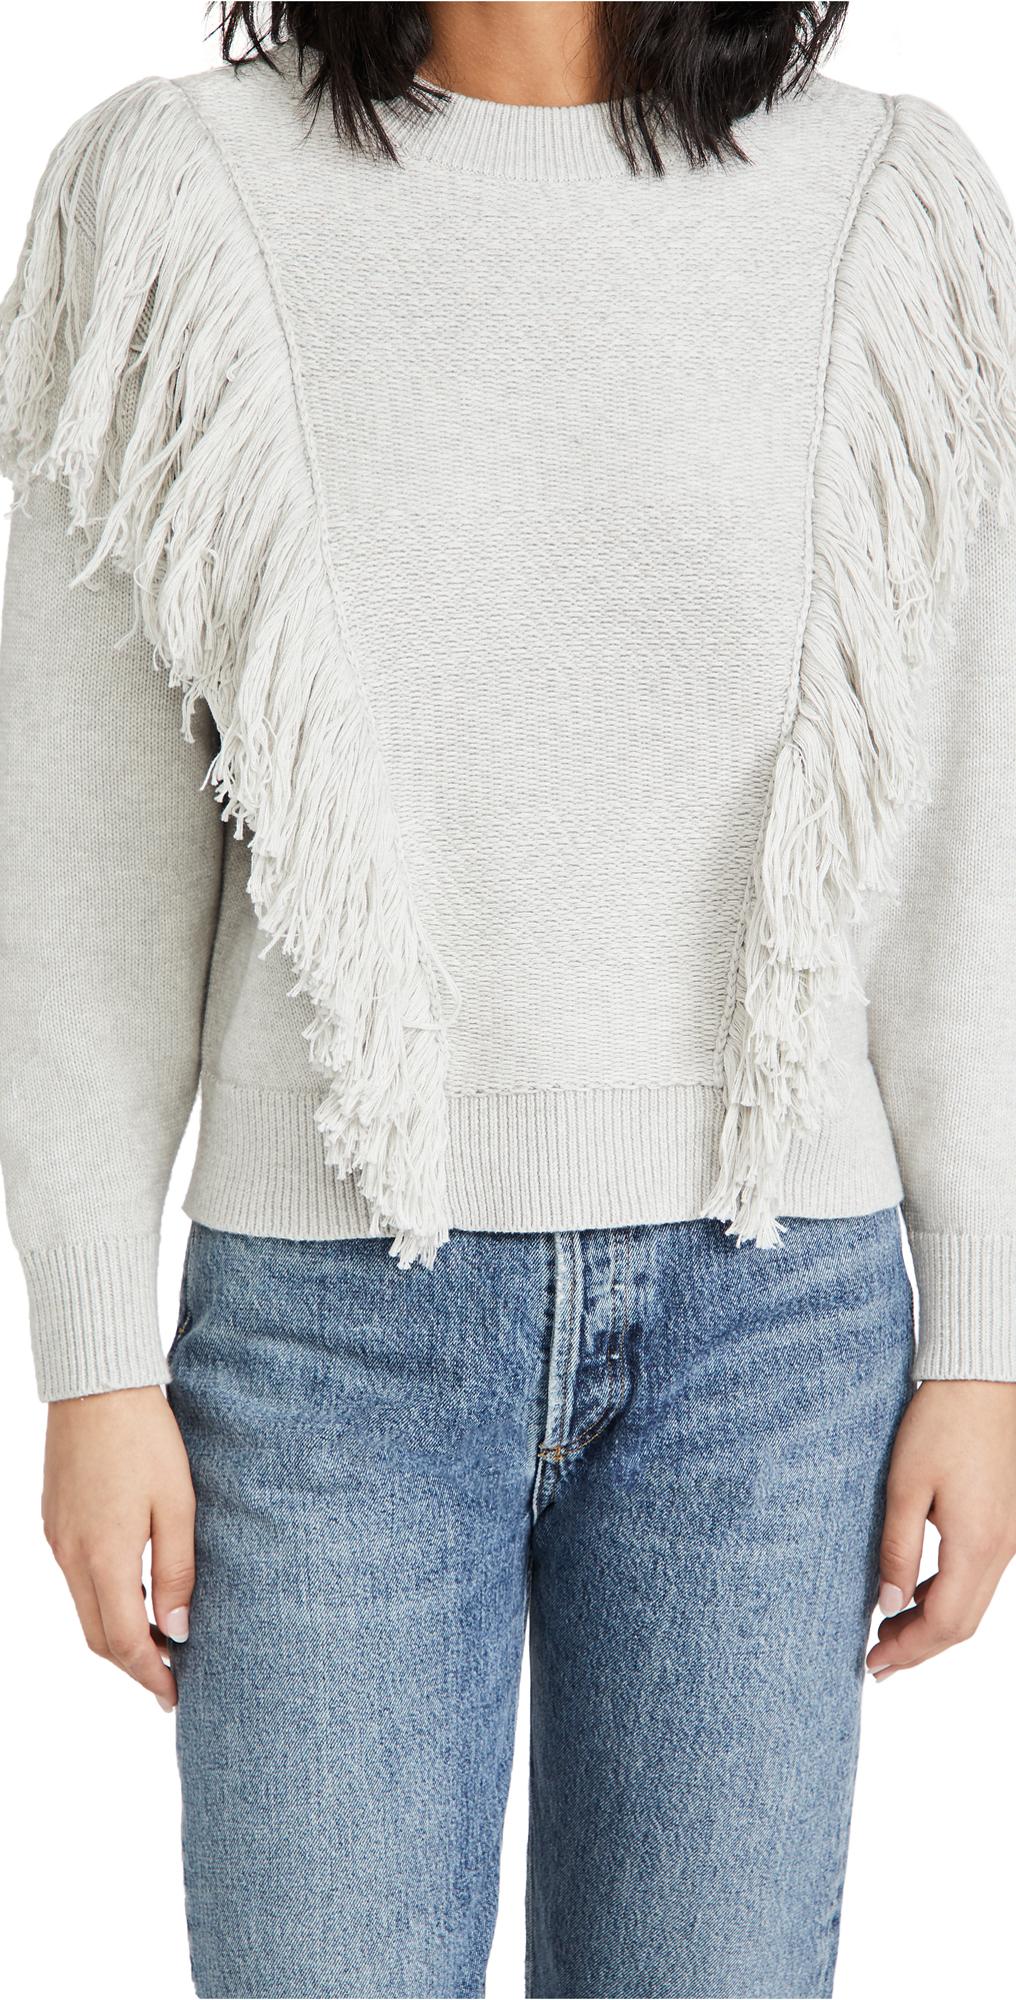 Zimmermann Botanica Fringe Sweater